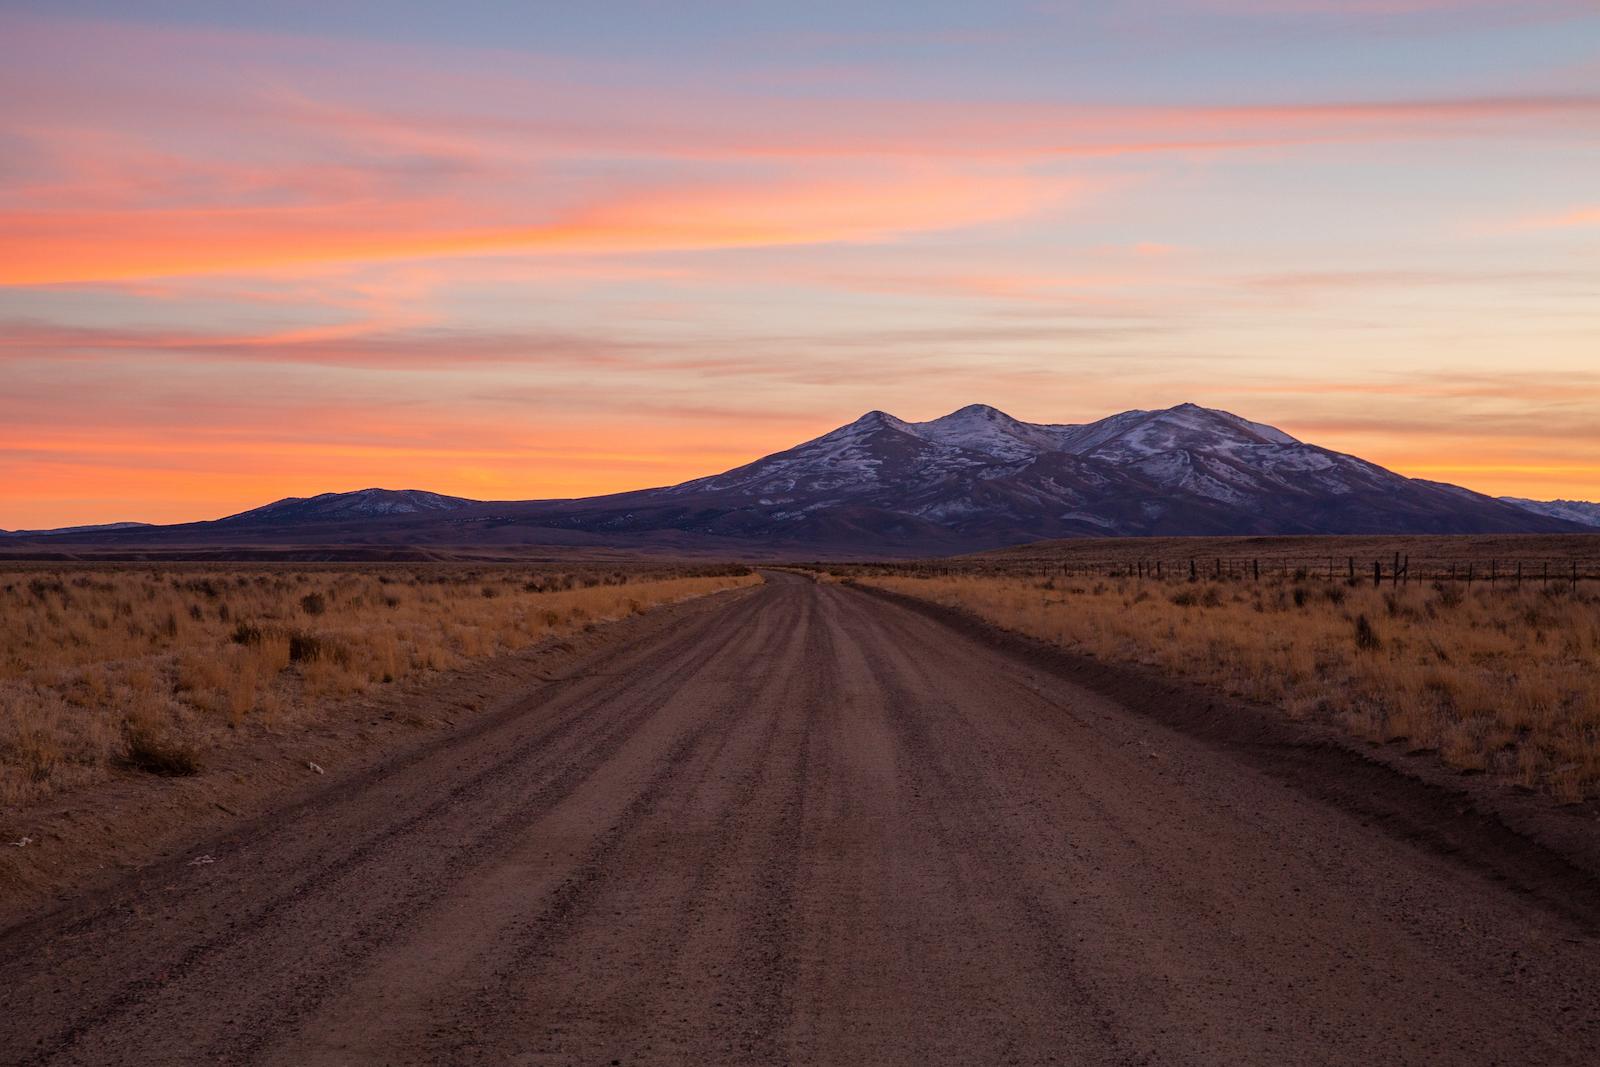 Sunset in Jackpot, Nevada